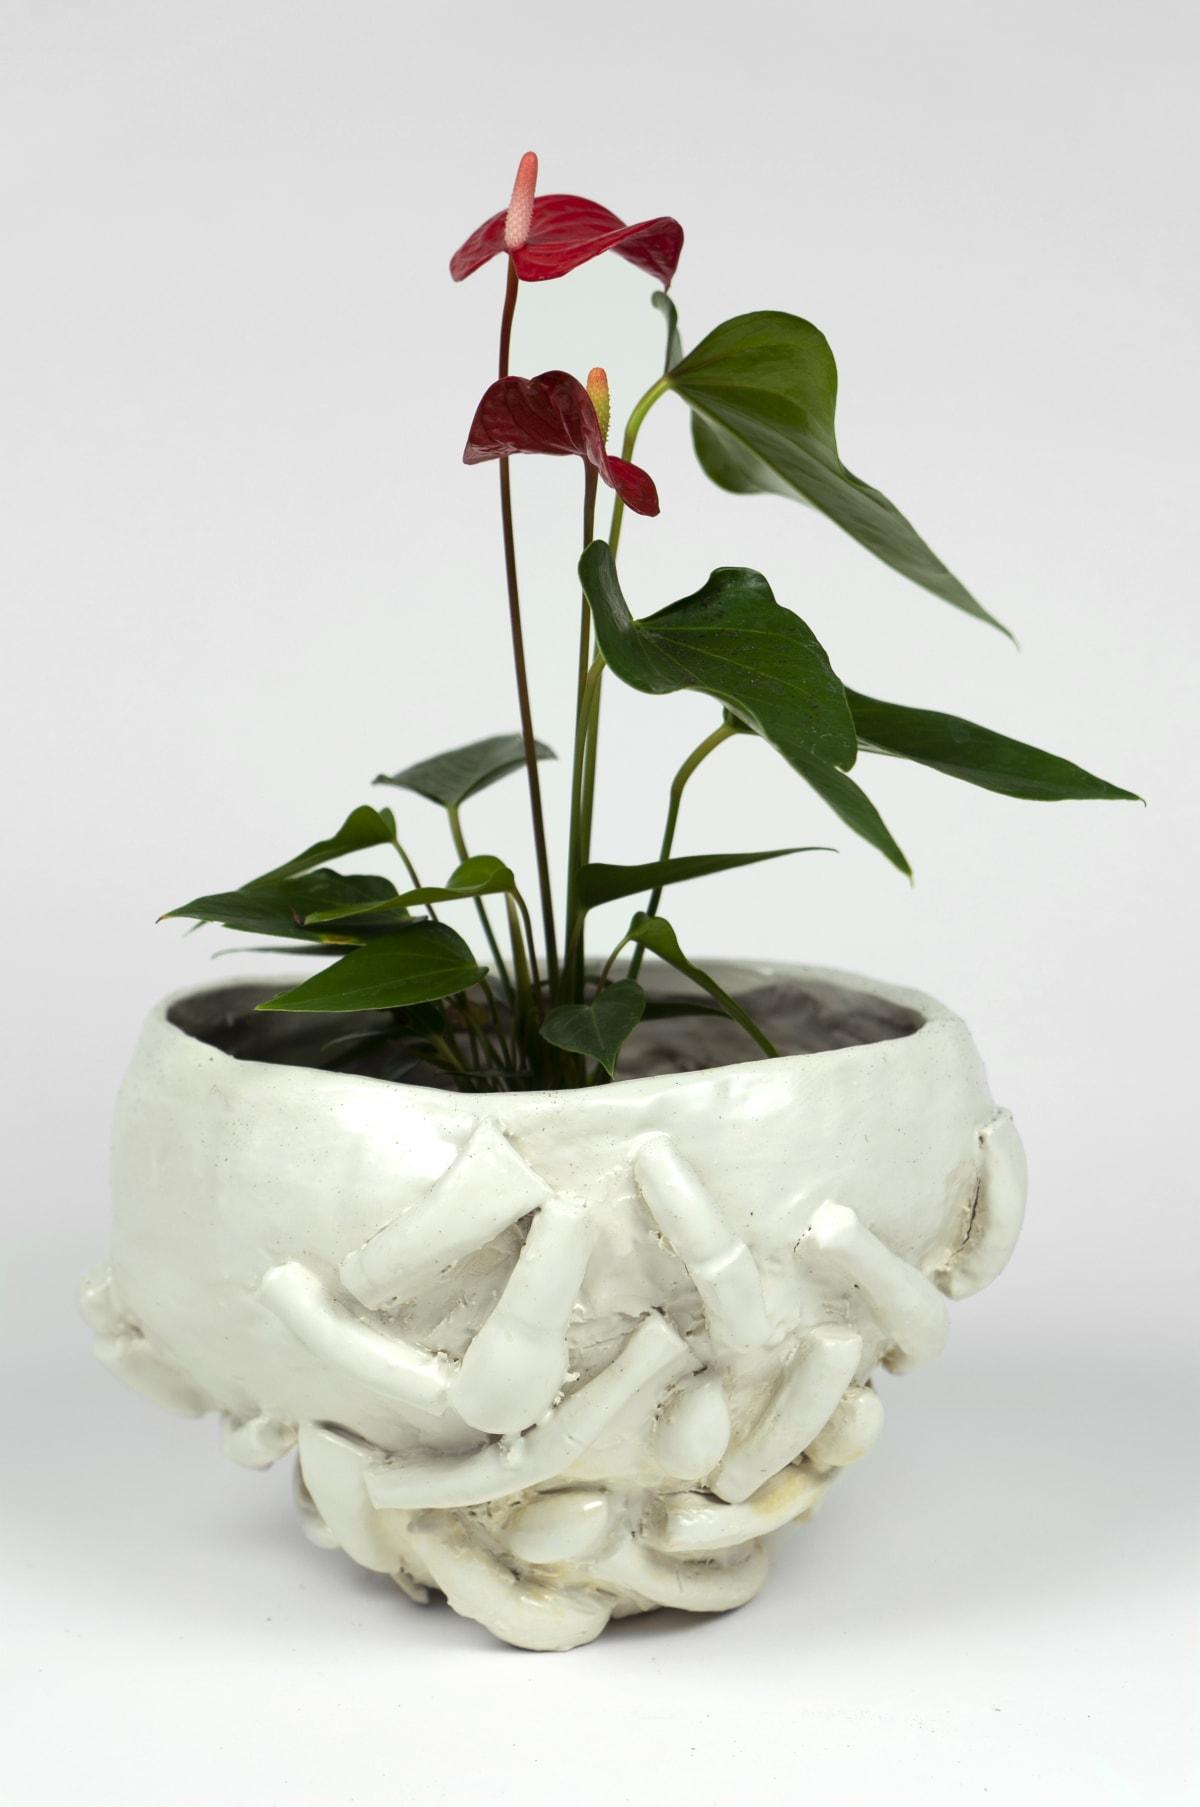 Ilana Harris-Babou, Plant 1, 2020